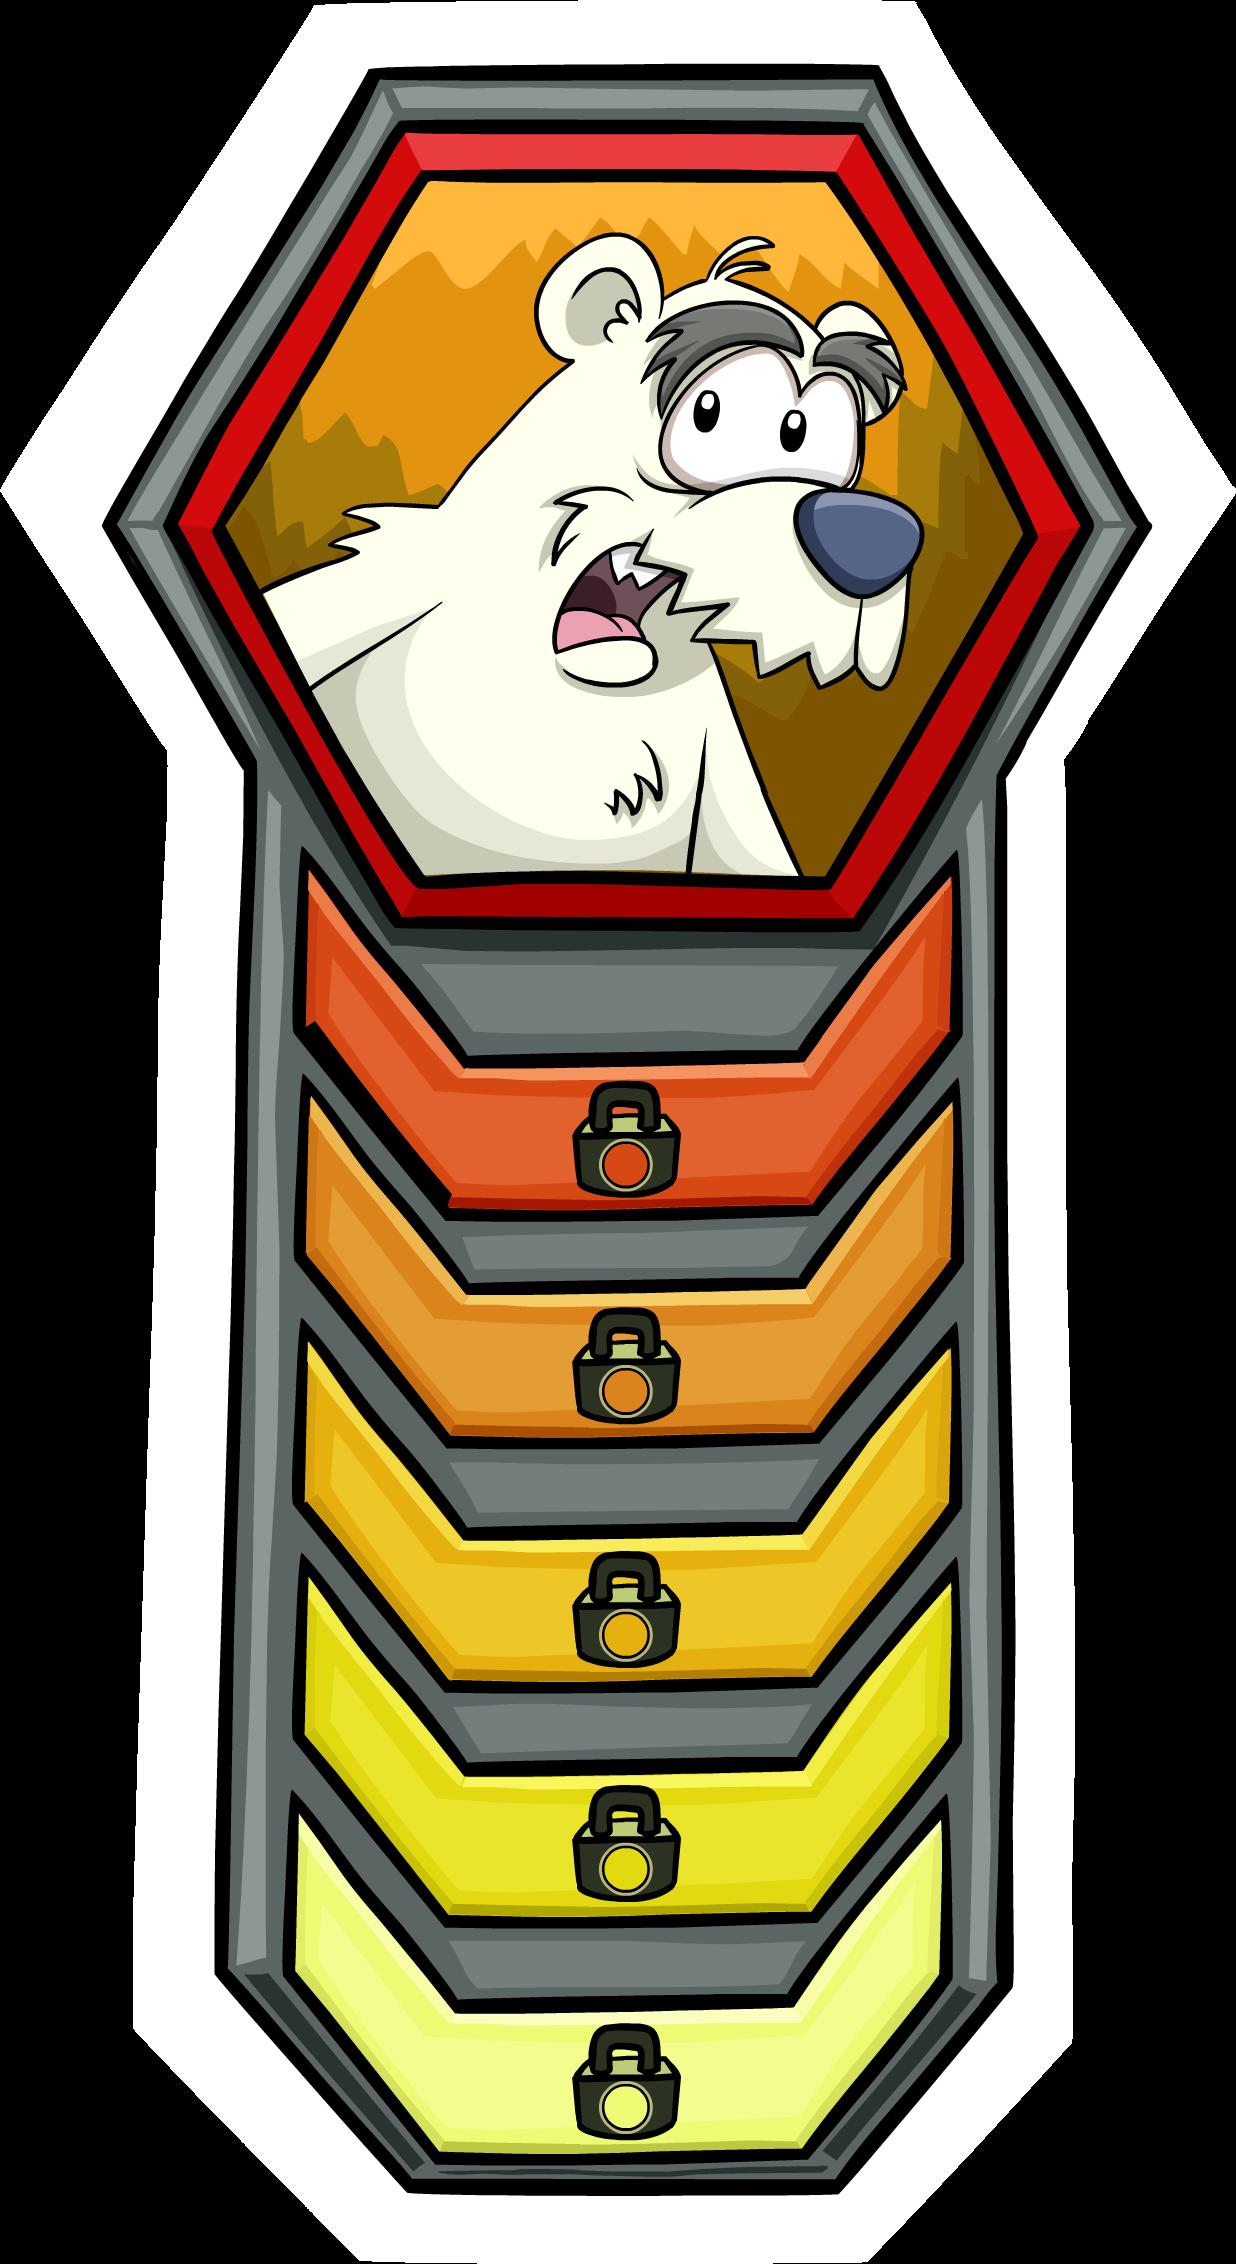 Herbert Security Clearance Pin